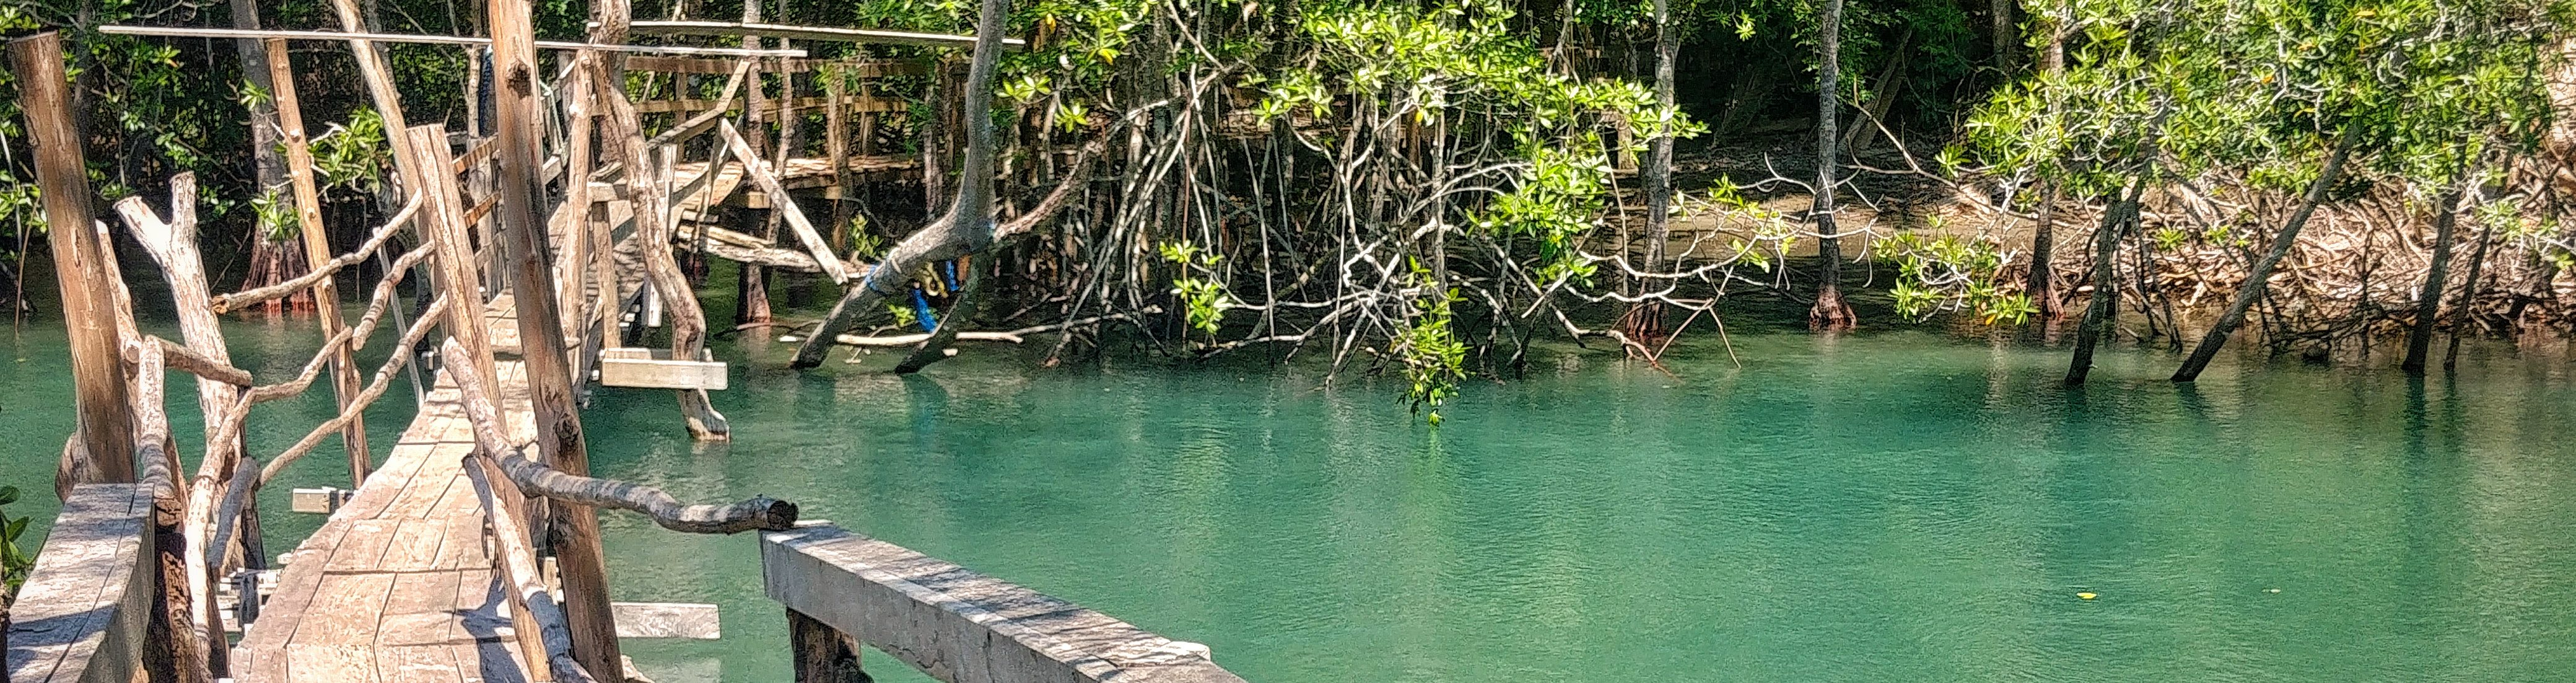 sud de Nicoya_pont_crocodiles_fleuve_nicoya_costa rica voyage